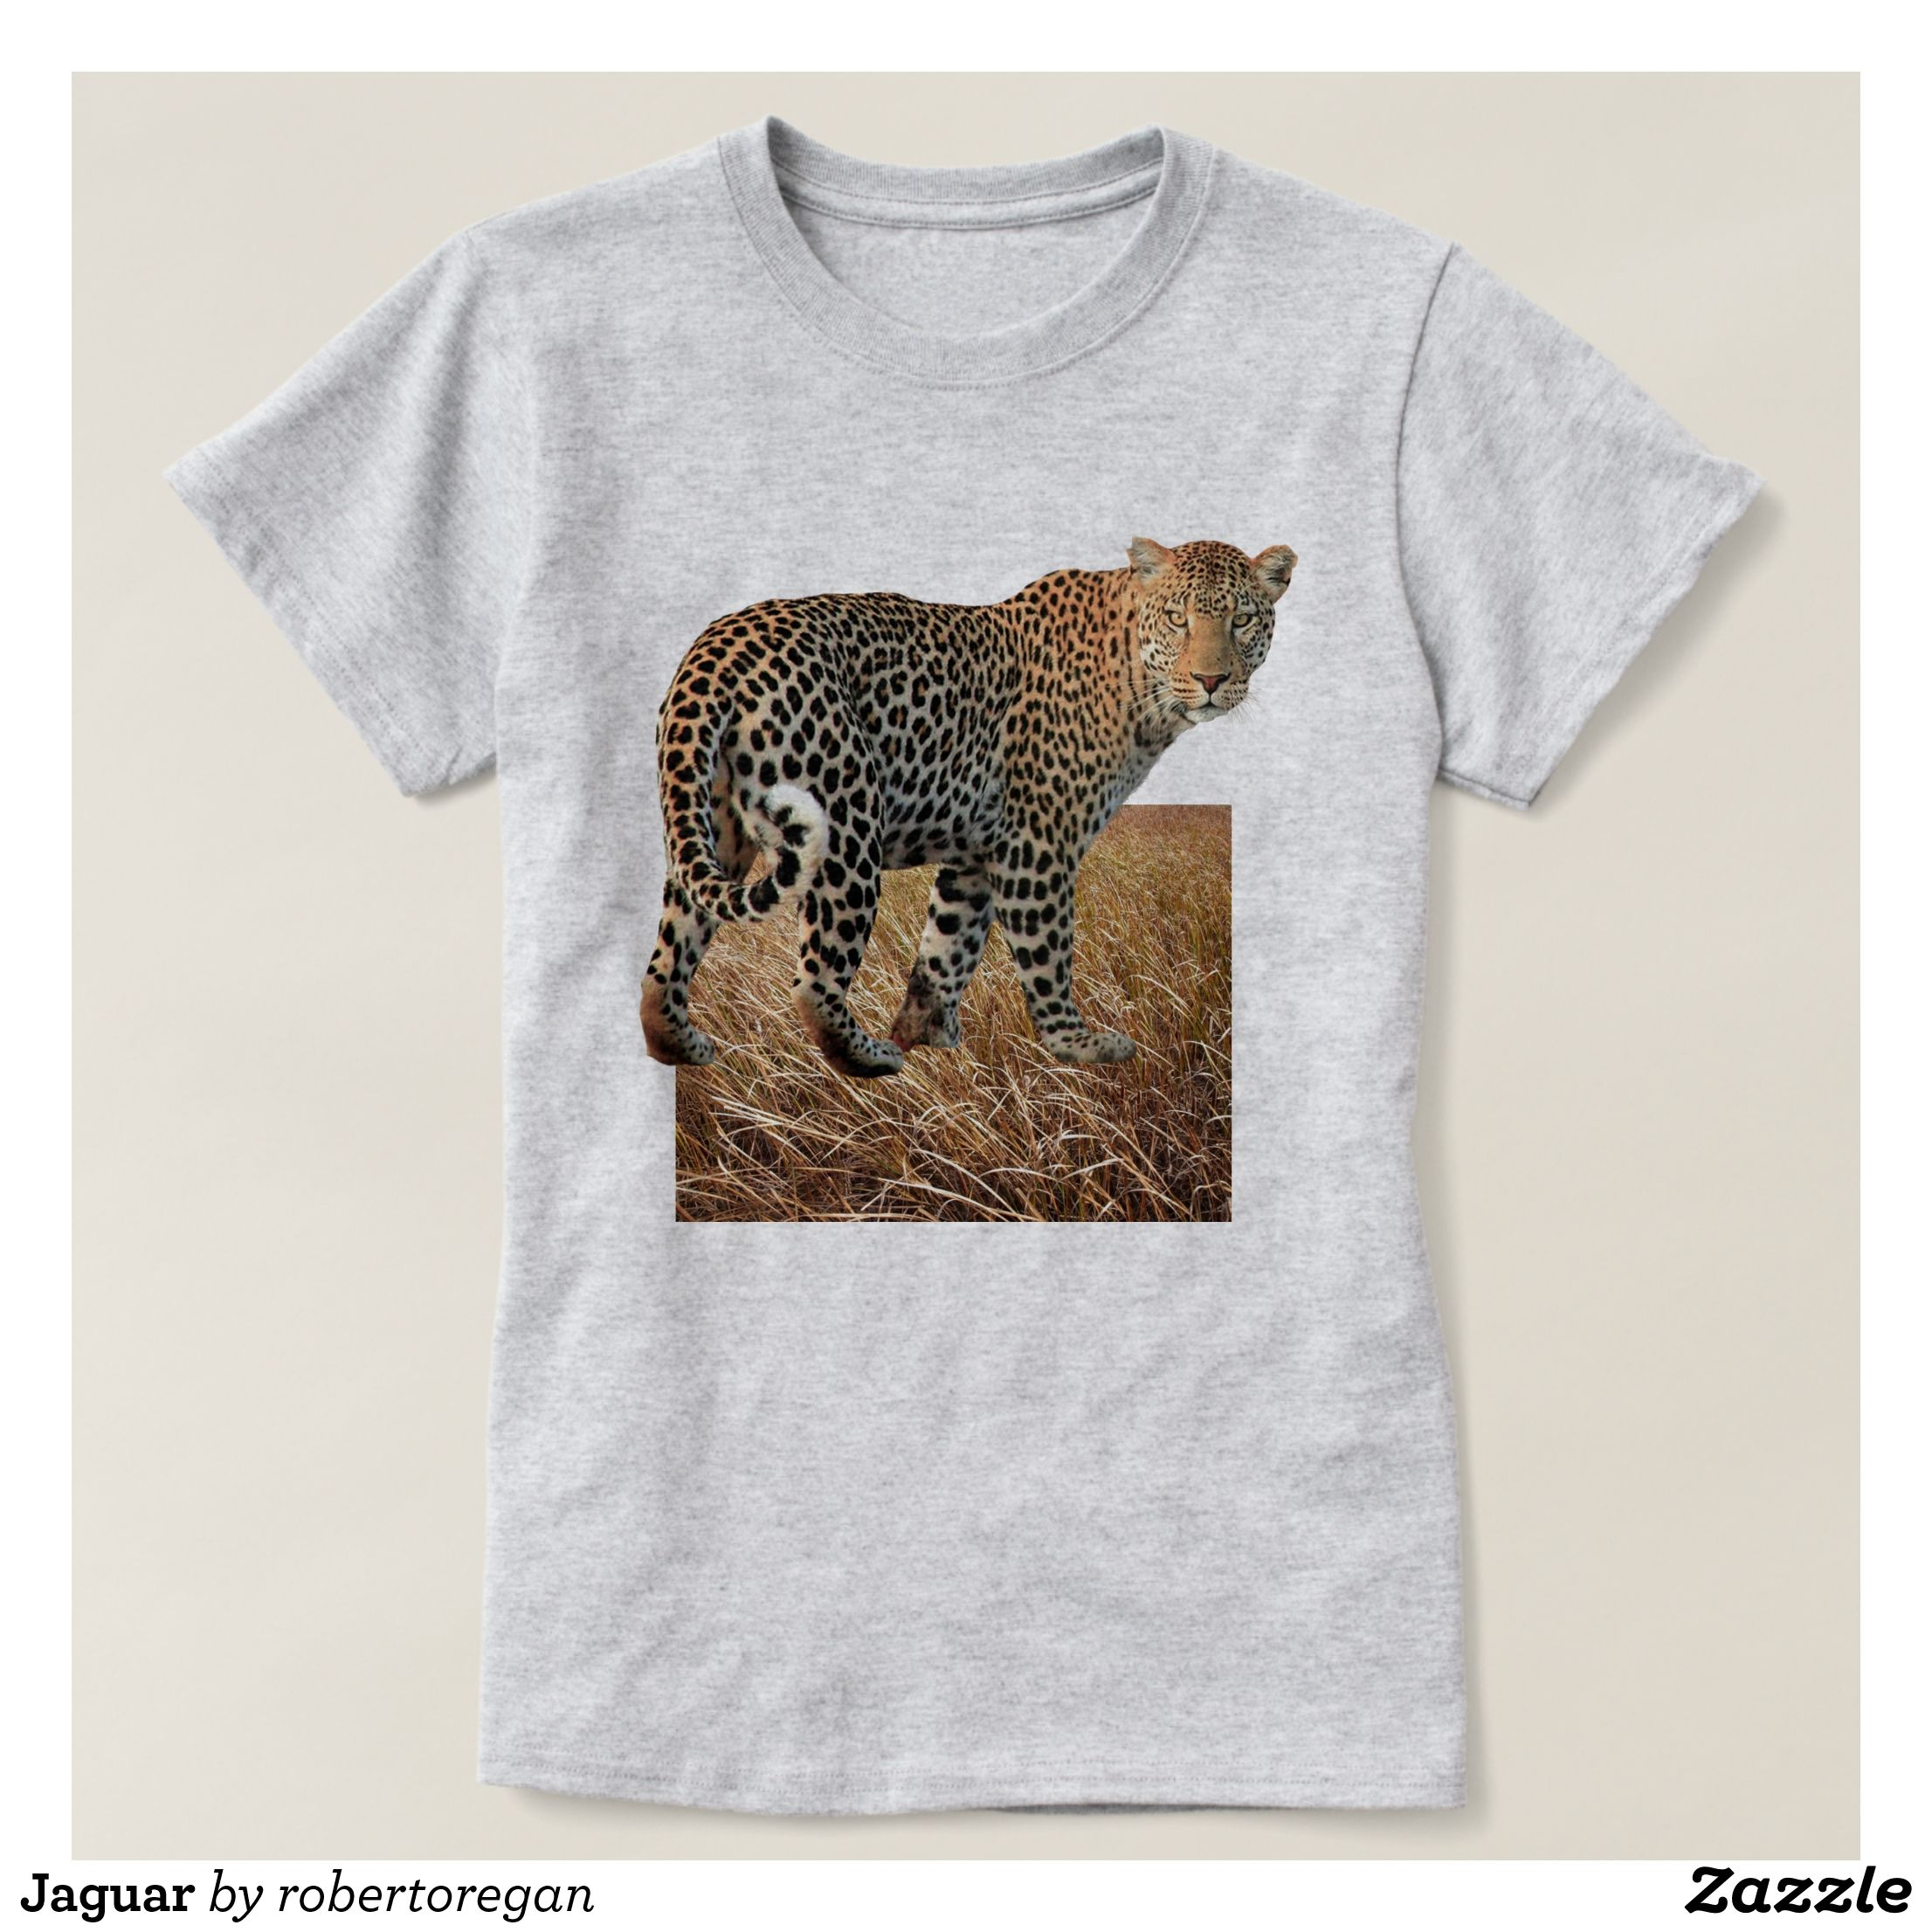 ah one ahmyshirt gift jaguar dabbing spgwvl shirt my t pose product shirts cla